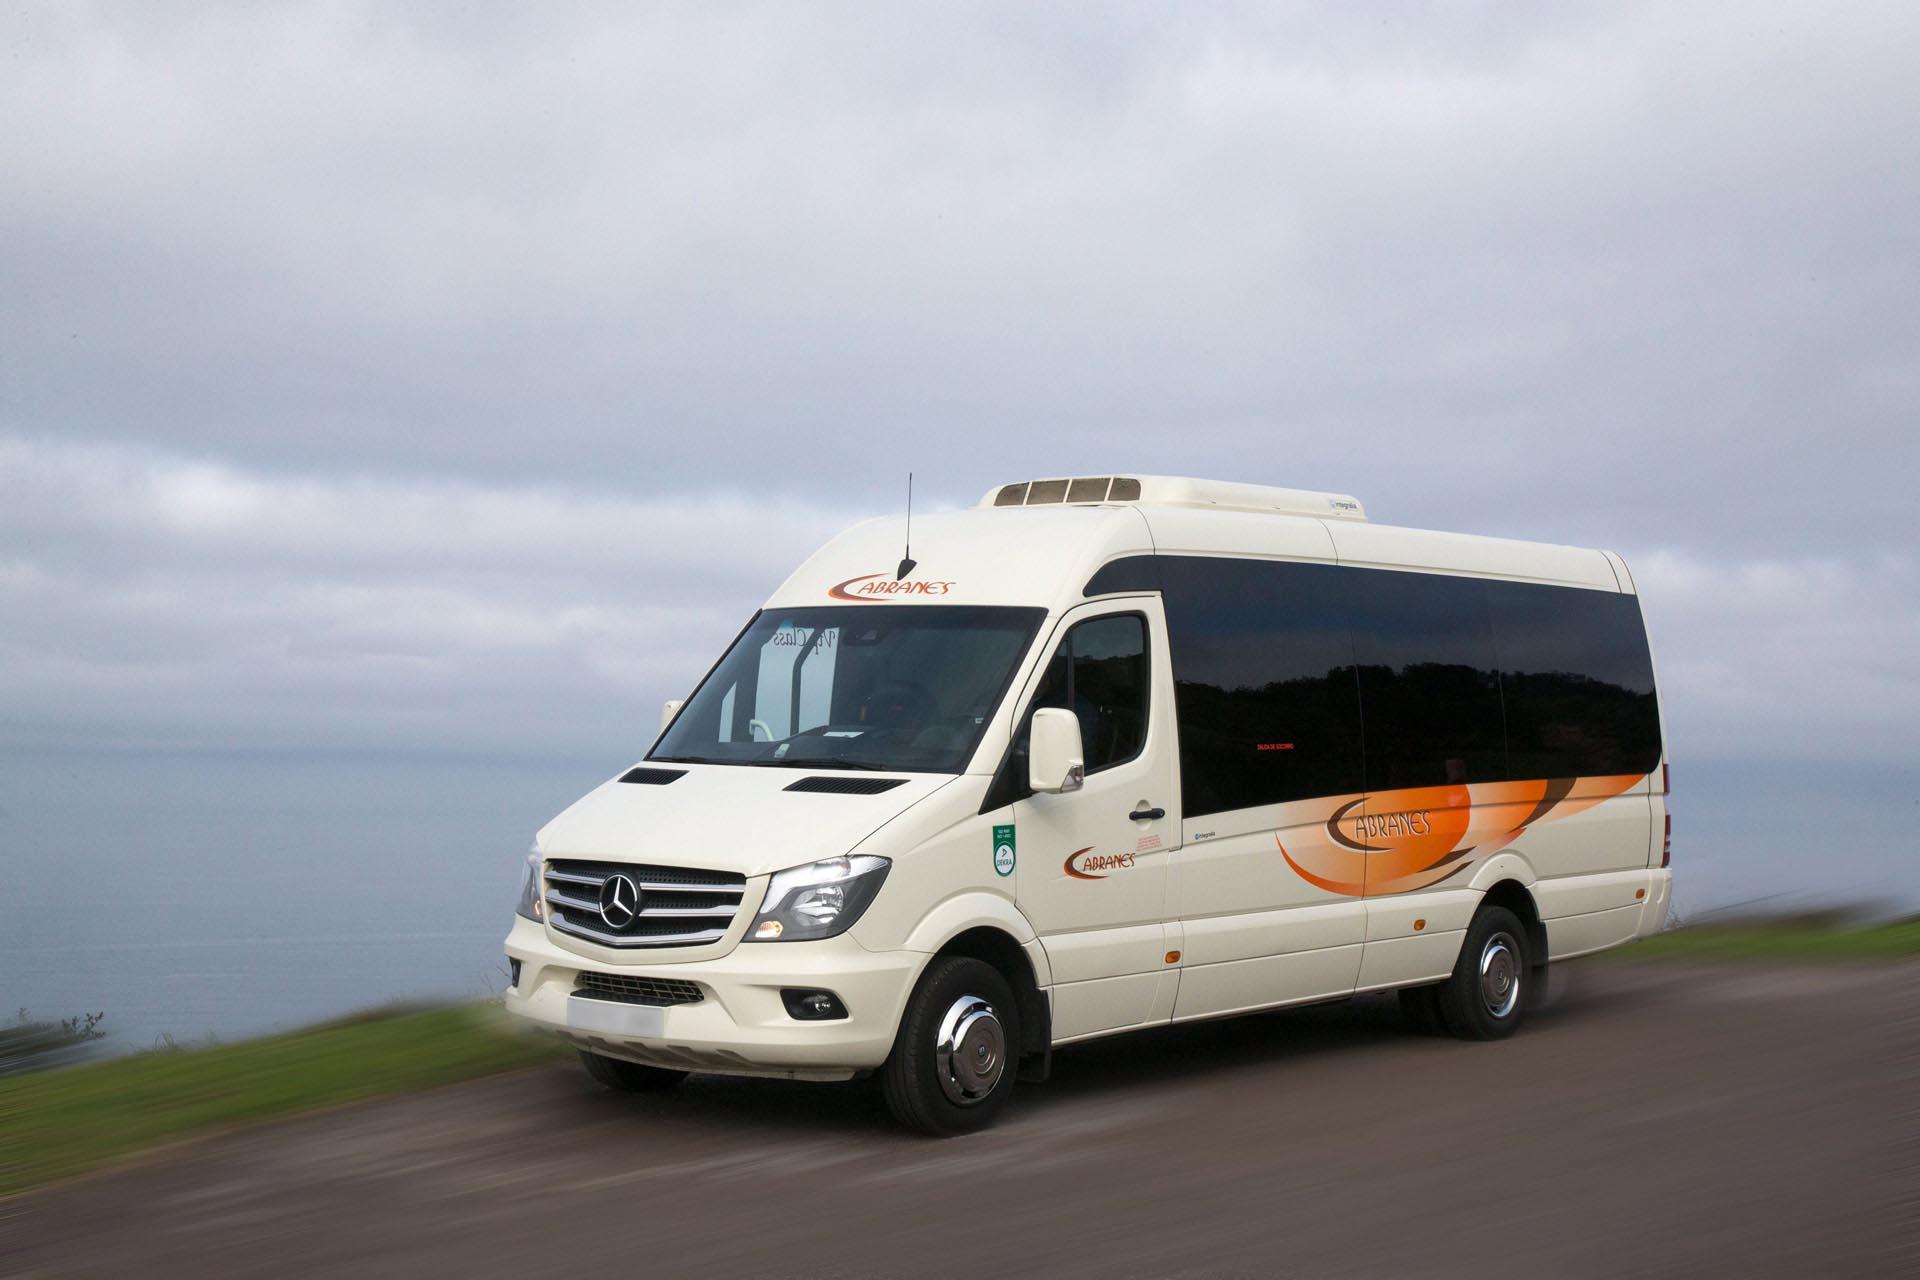 Alquiler microbuses de lujo